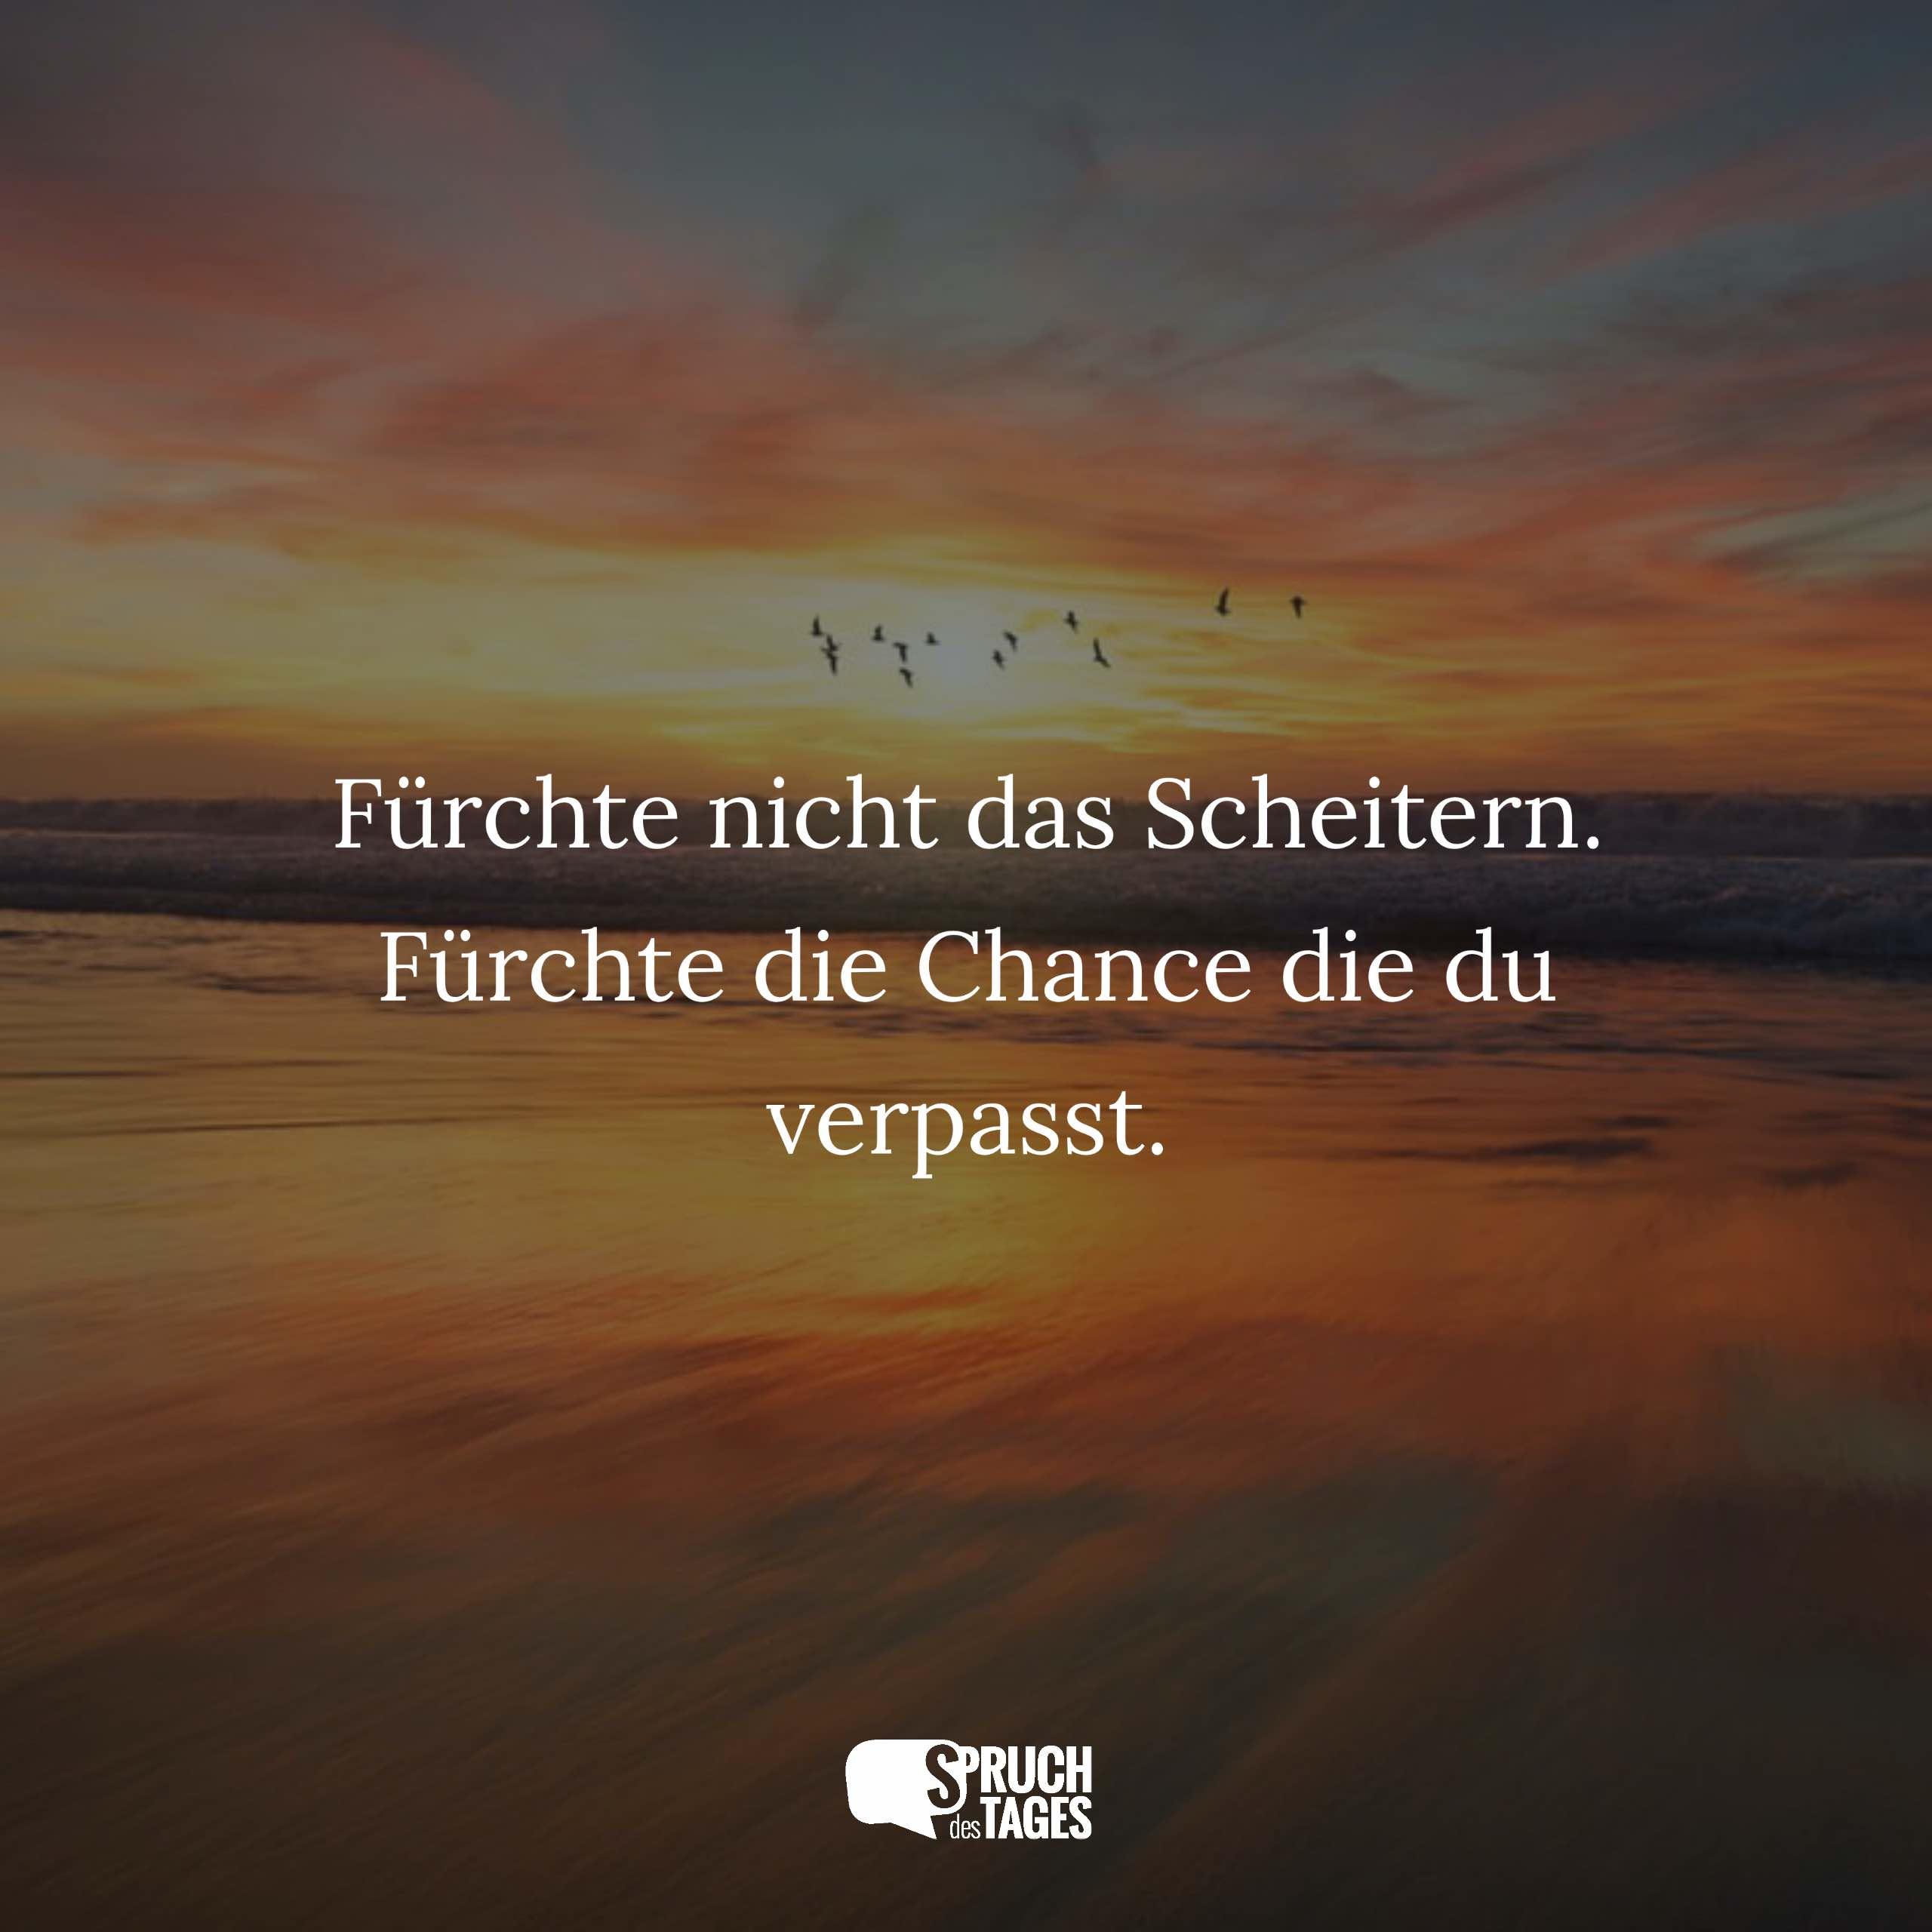 Sprüche 2 chance Glossary of